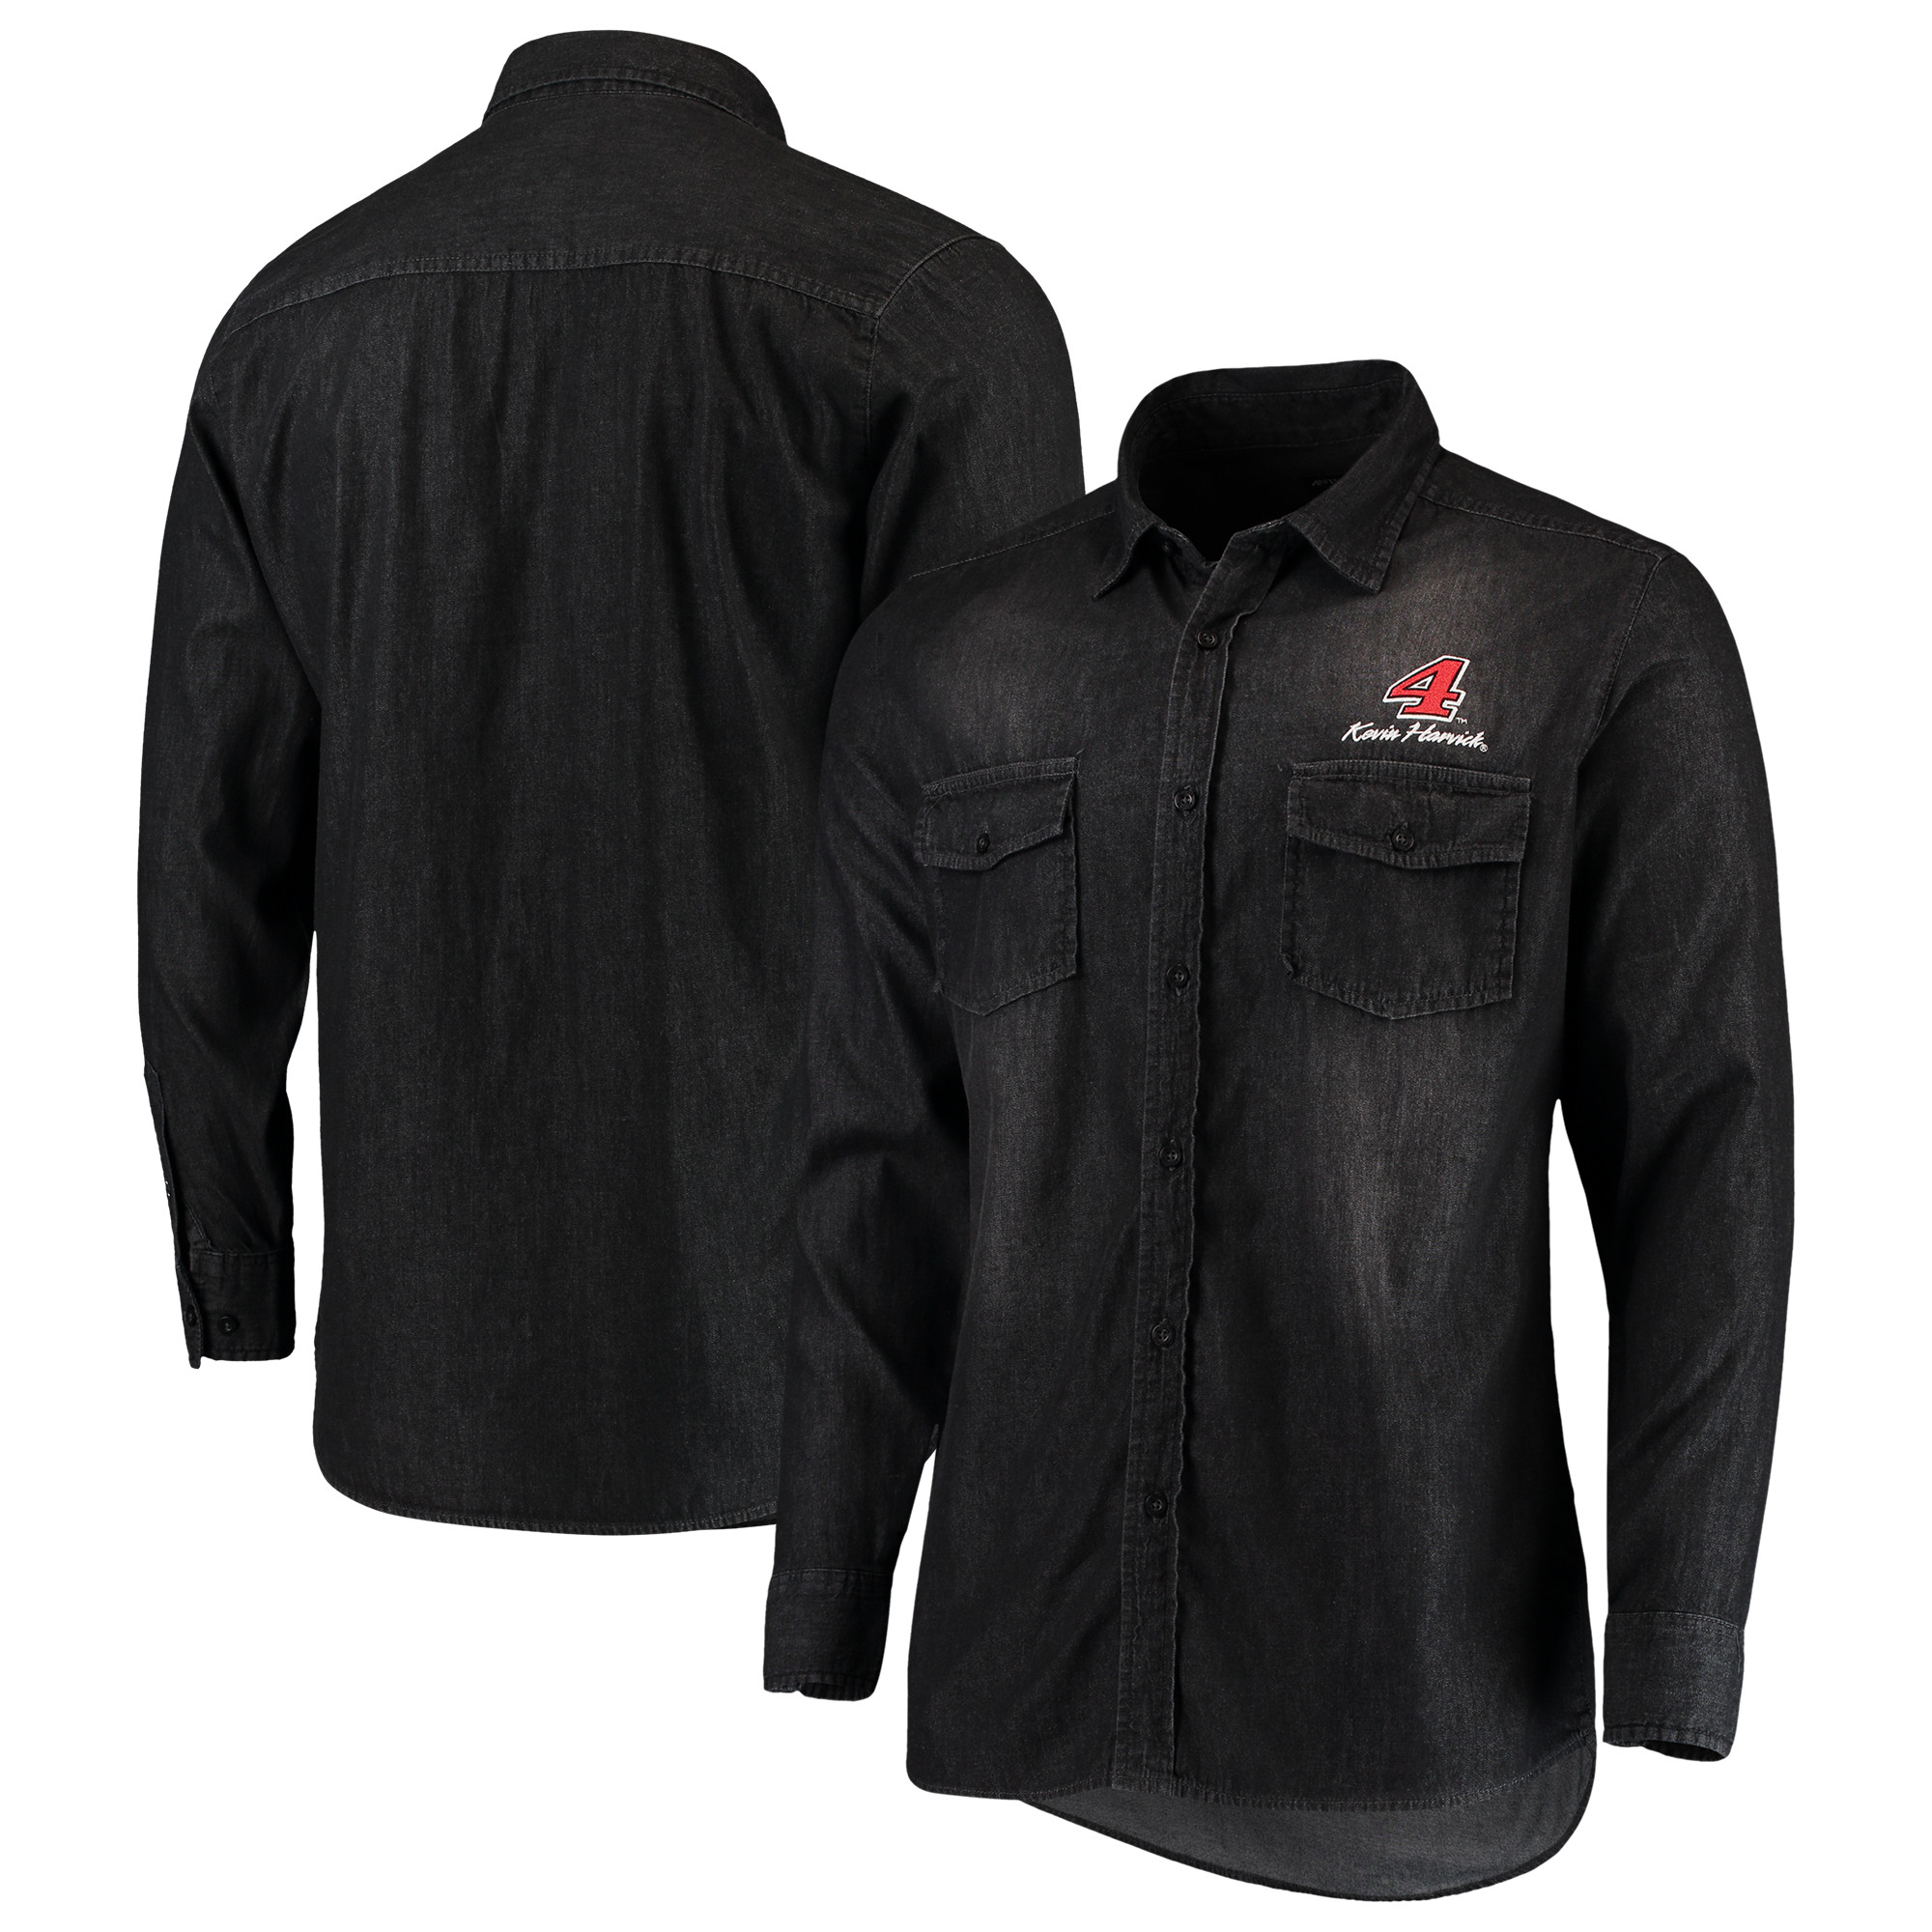 Kevin Harvick Antigua Outlook Long Sleeve Button-Up Chambray Shirt - Black